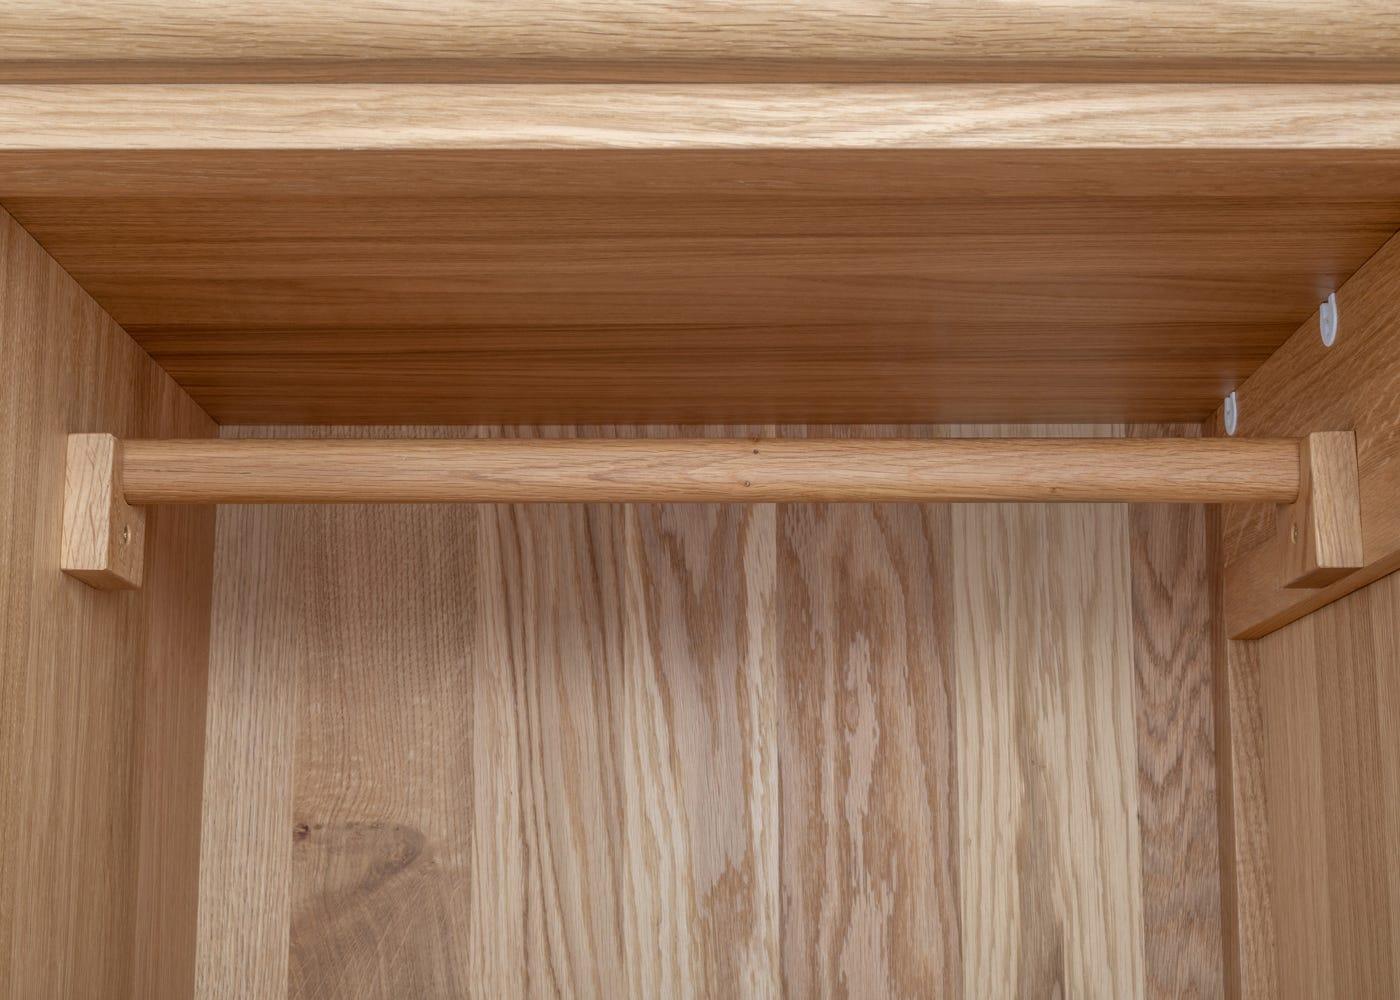 Solid oak rail